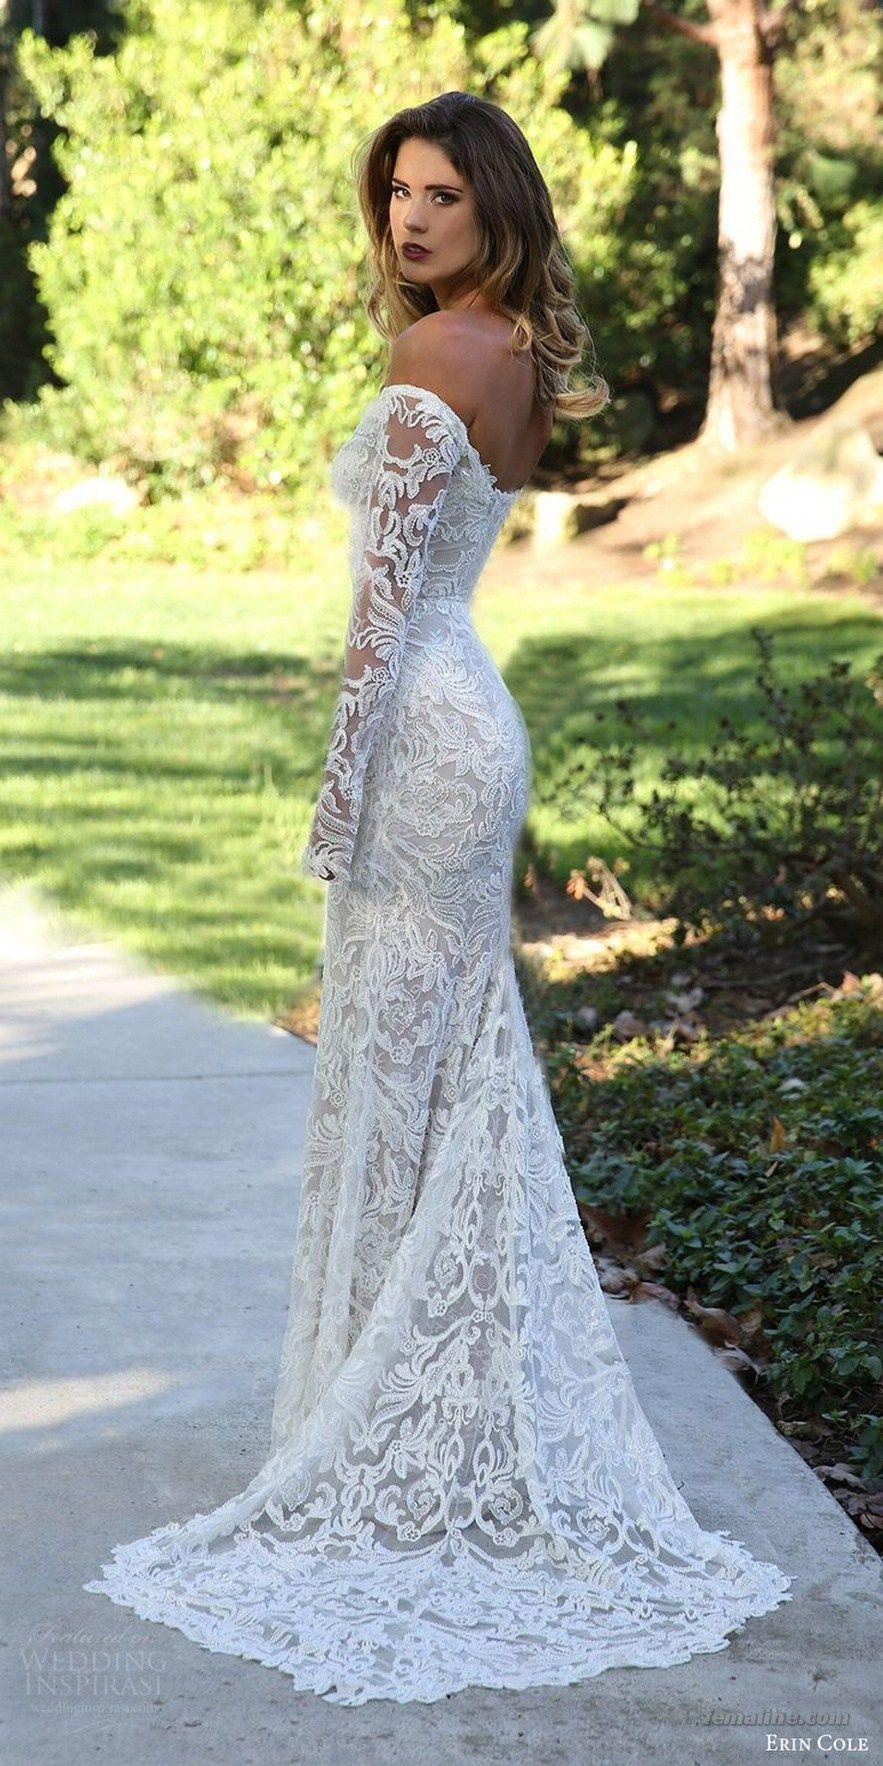 139 ideas for fall 2017 wedding dress trends (47) | Bälle ...